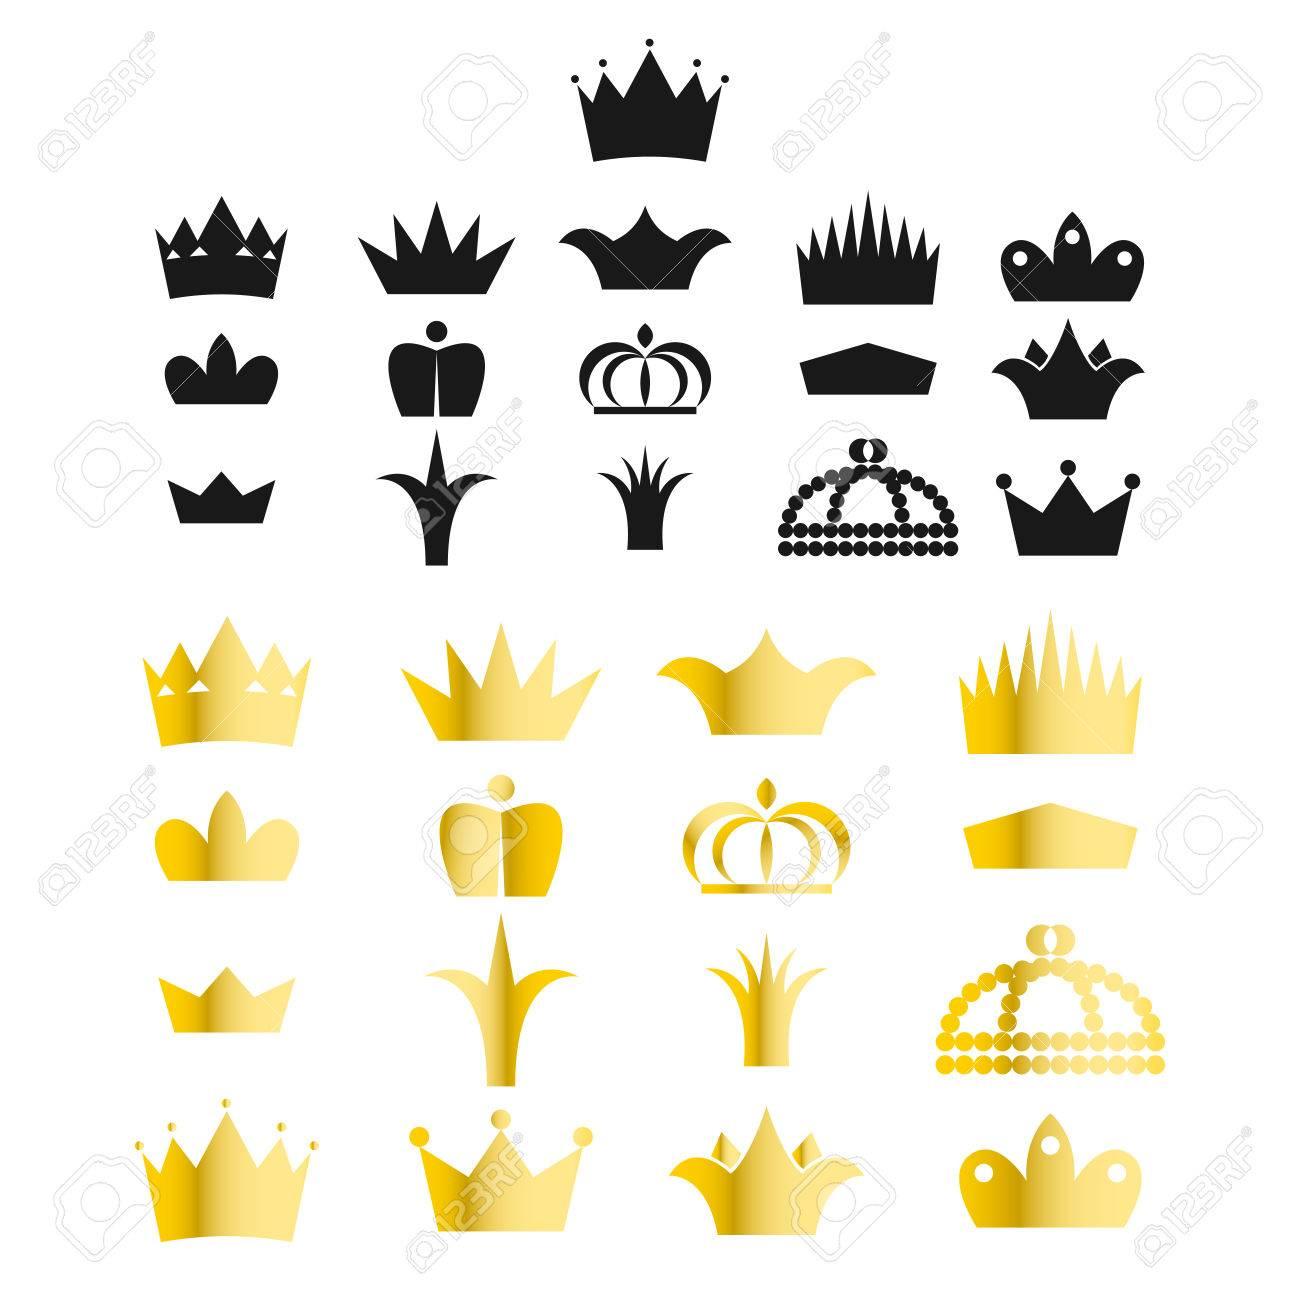 Gold Crown Clip Art Vector Set King Or Queen Crowns Gradient